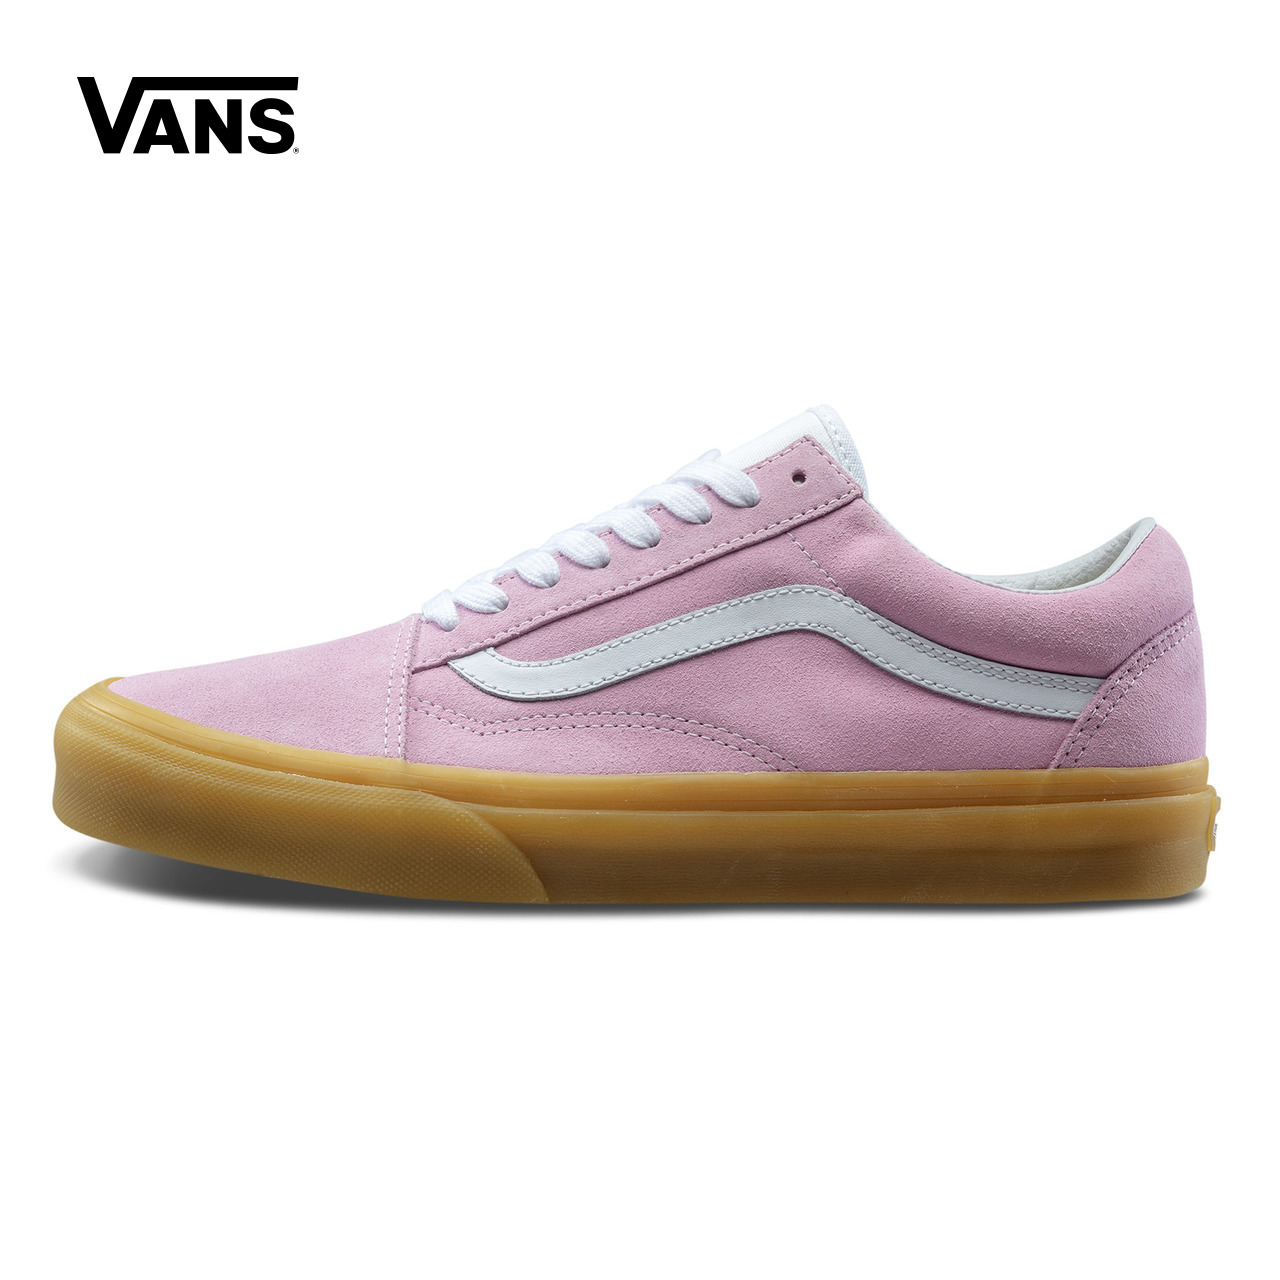 Vans 范斯官方男女款OLD SKOOL板鞋|VN0A38G1QK7-QK8